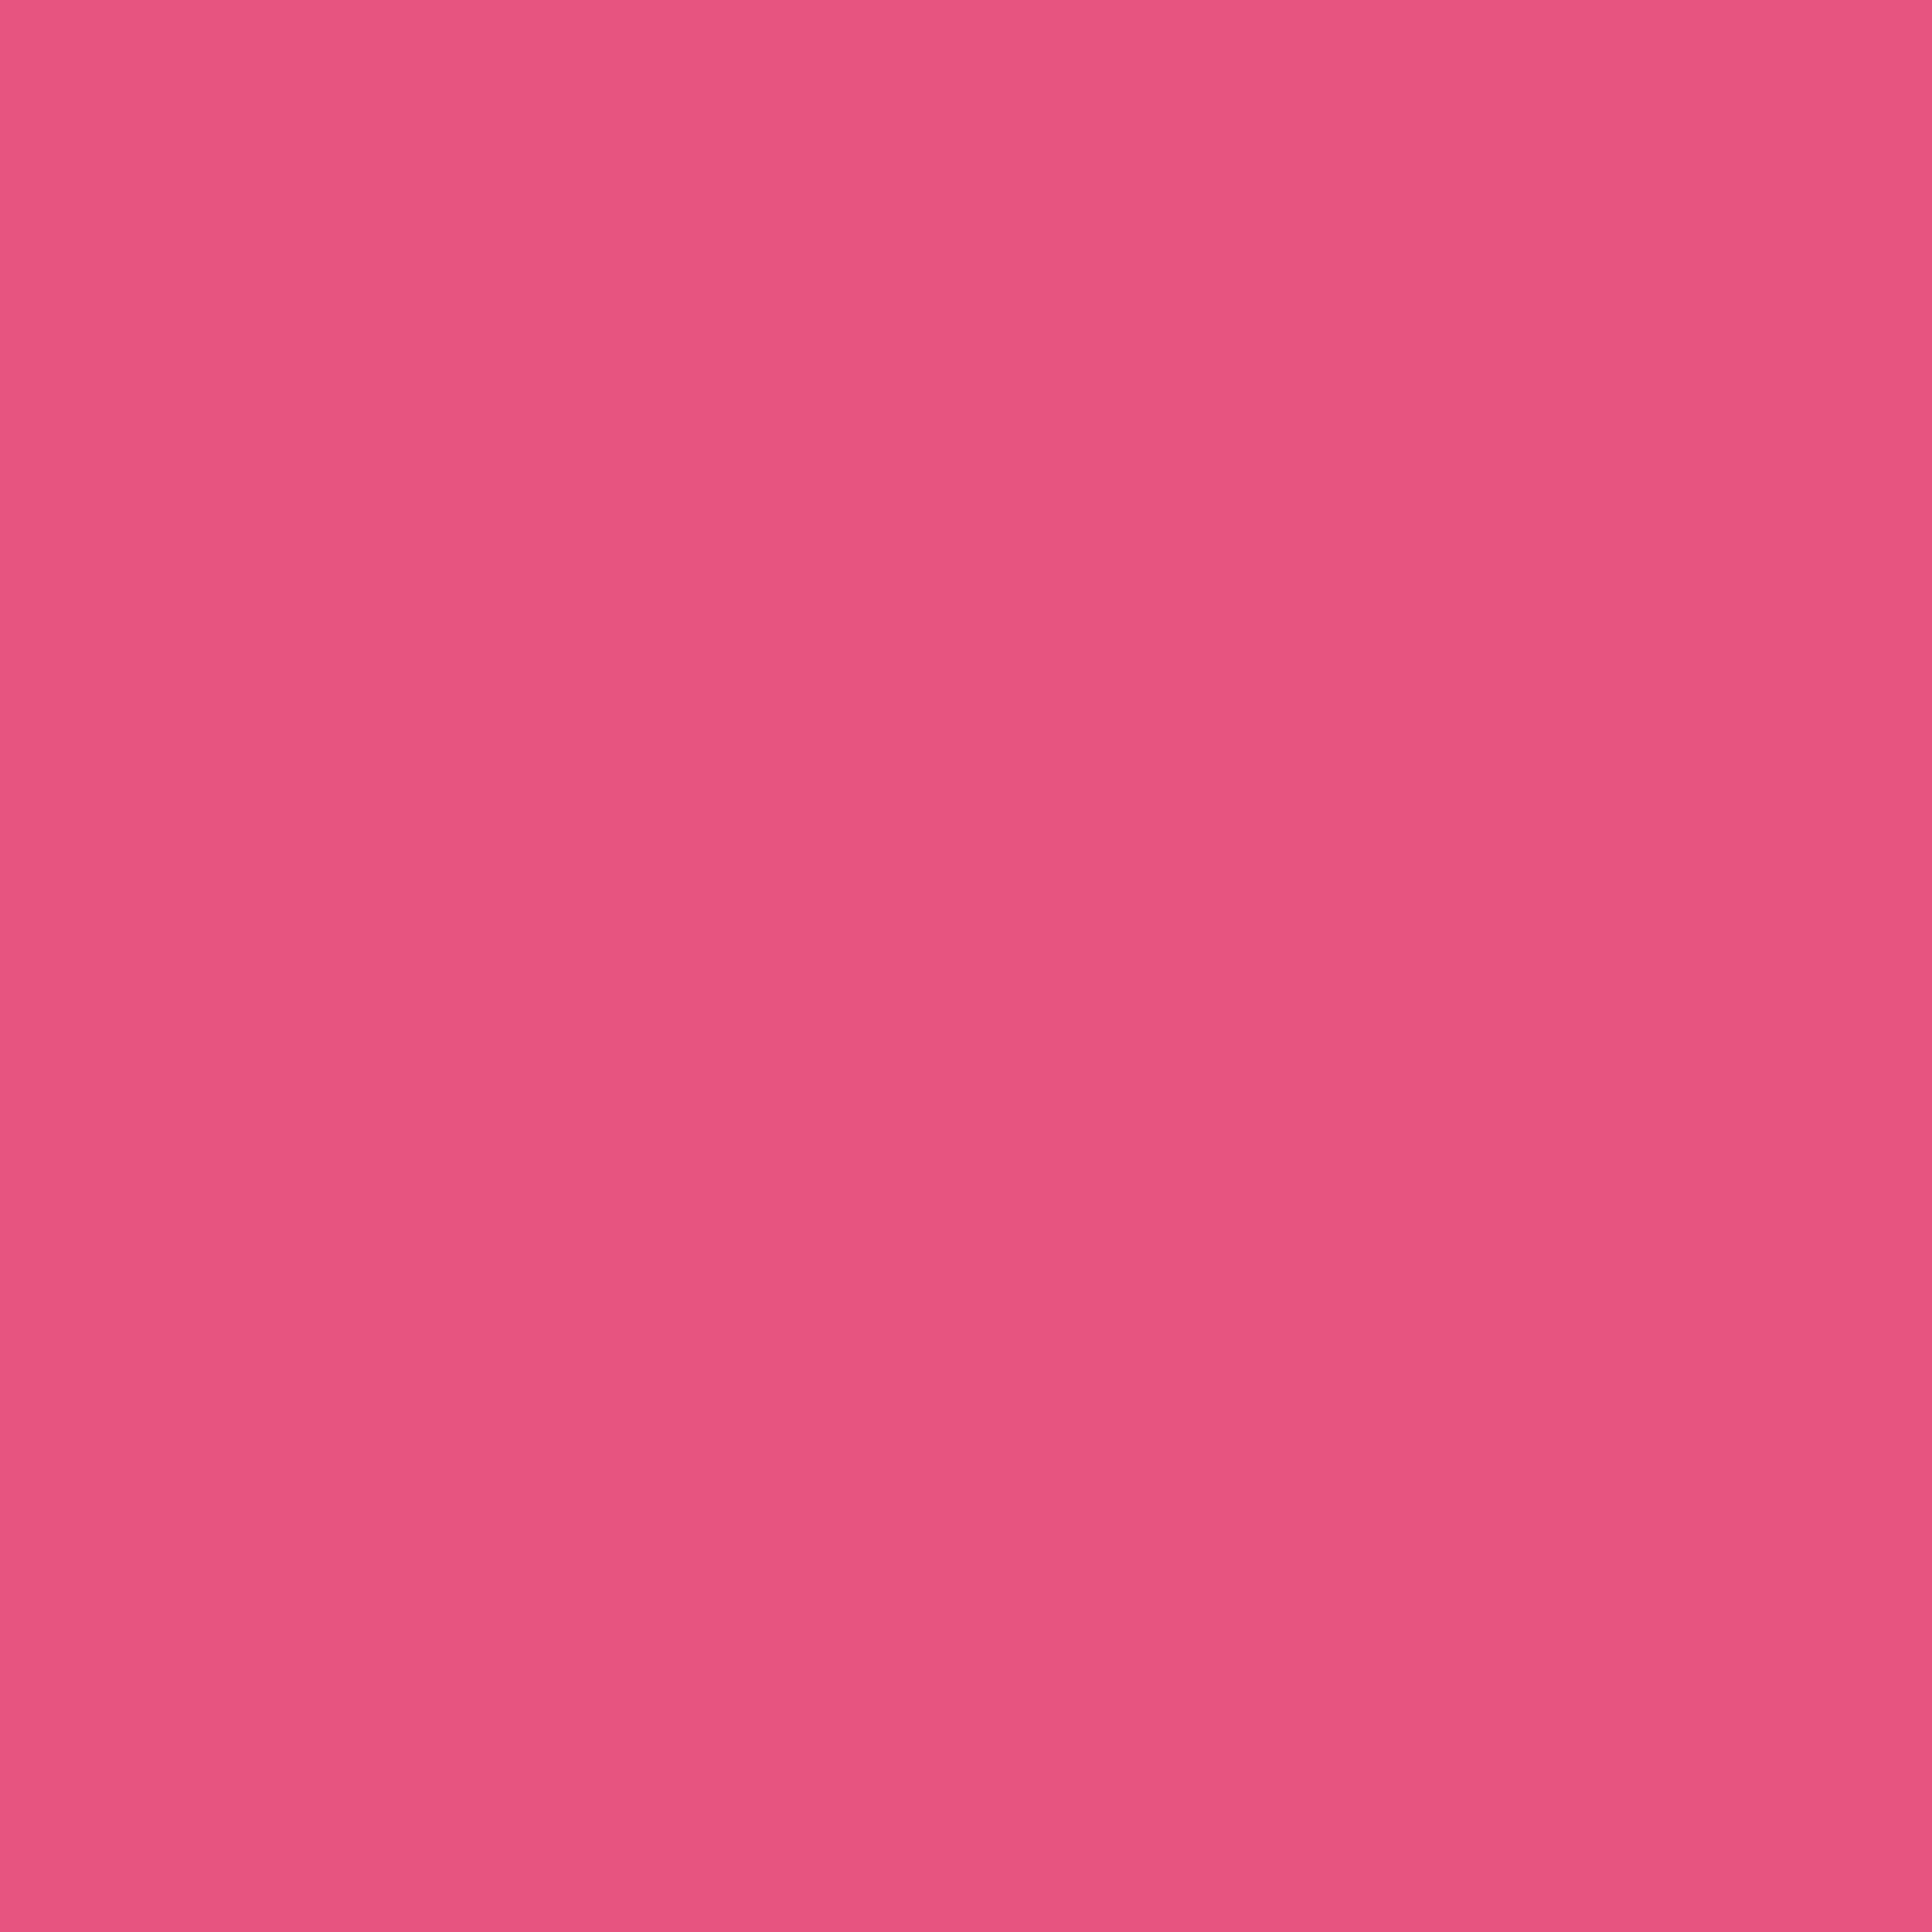 Pink Color Background - Bing images